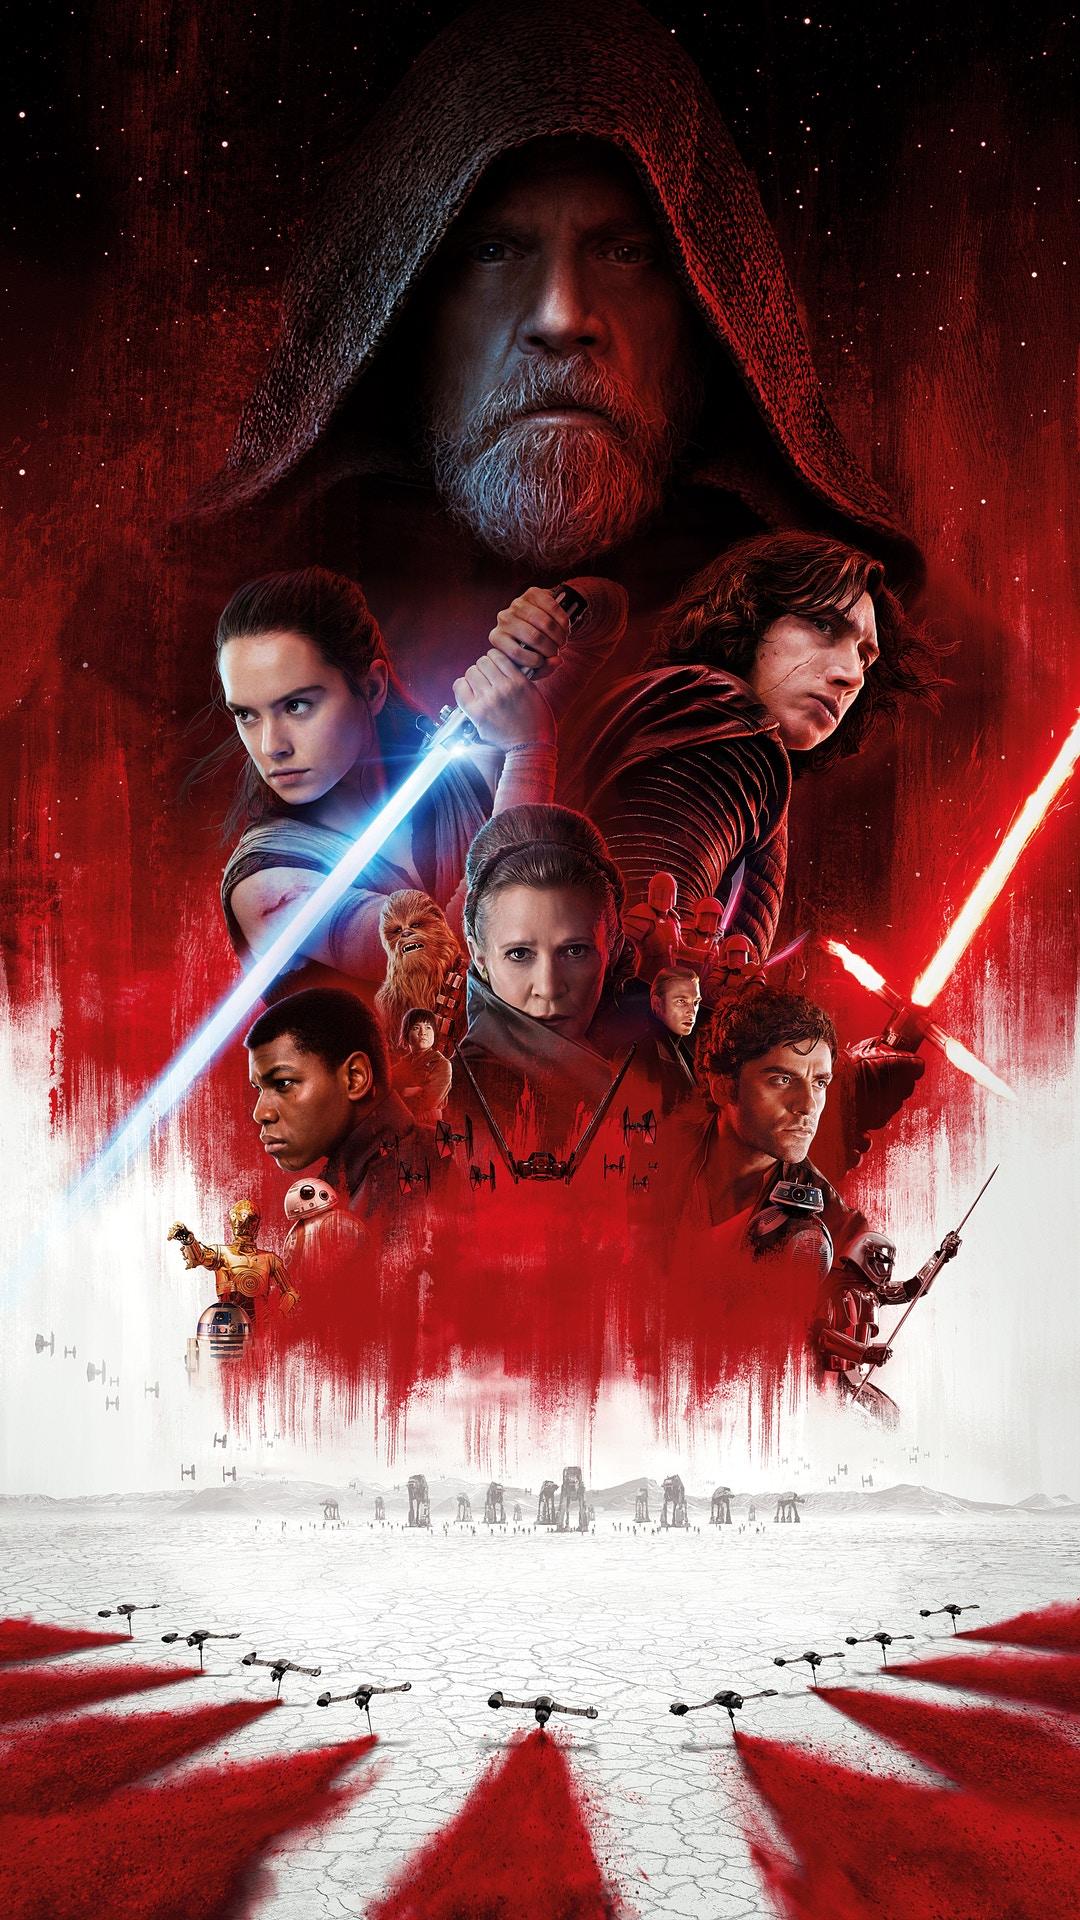 Fondos de pantalla de star wars for Fondo de pantalla star wars